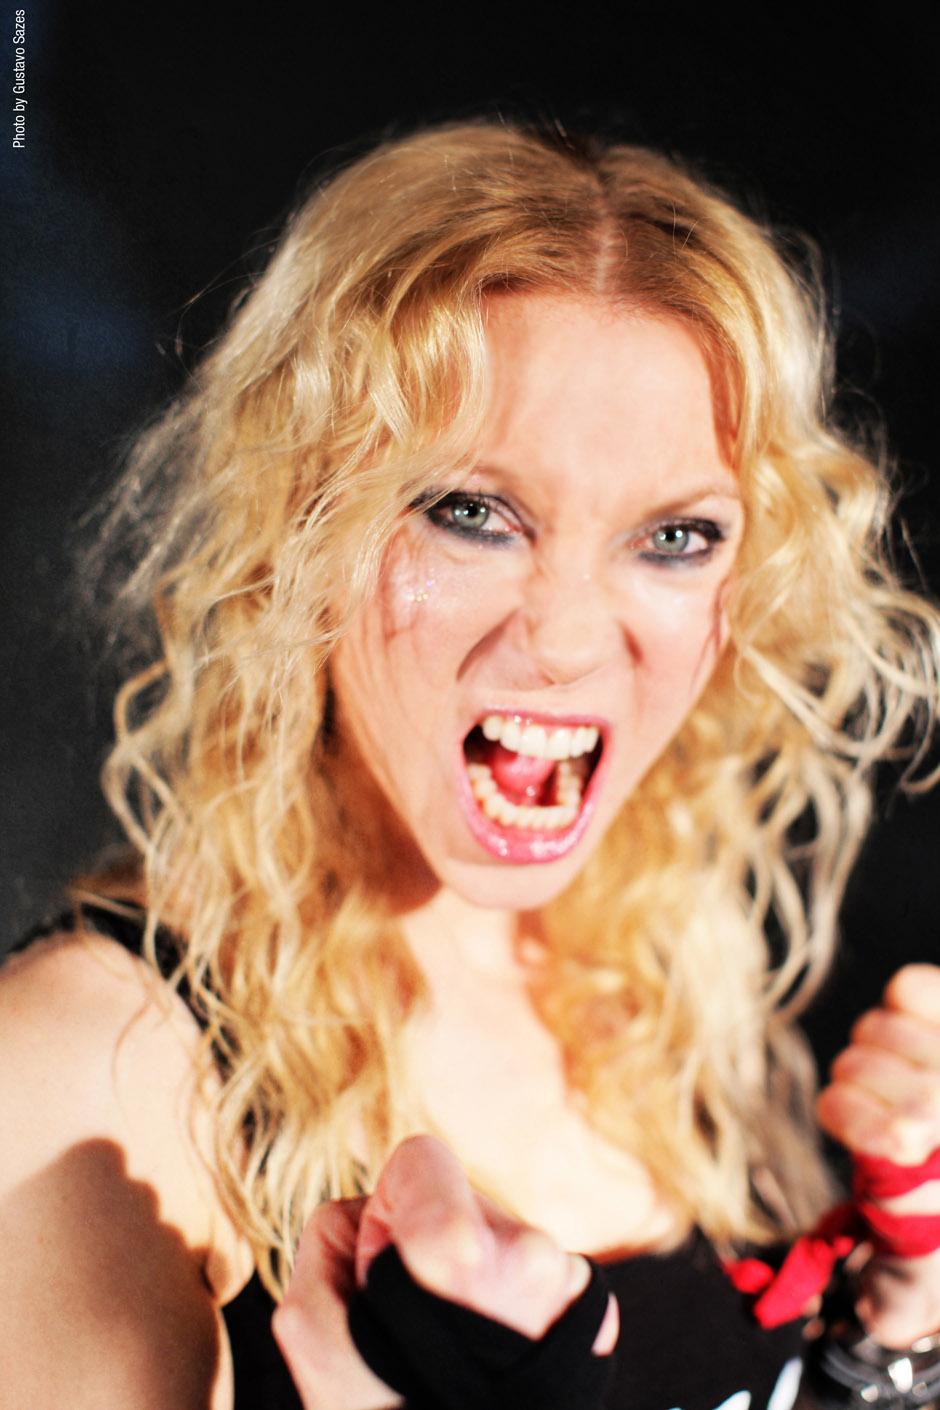 Angela Gossow, Arch Enemy